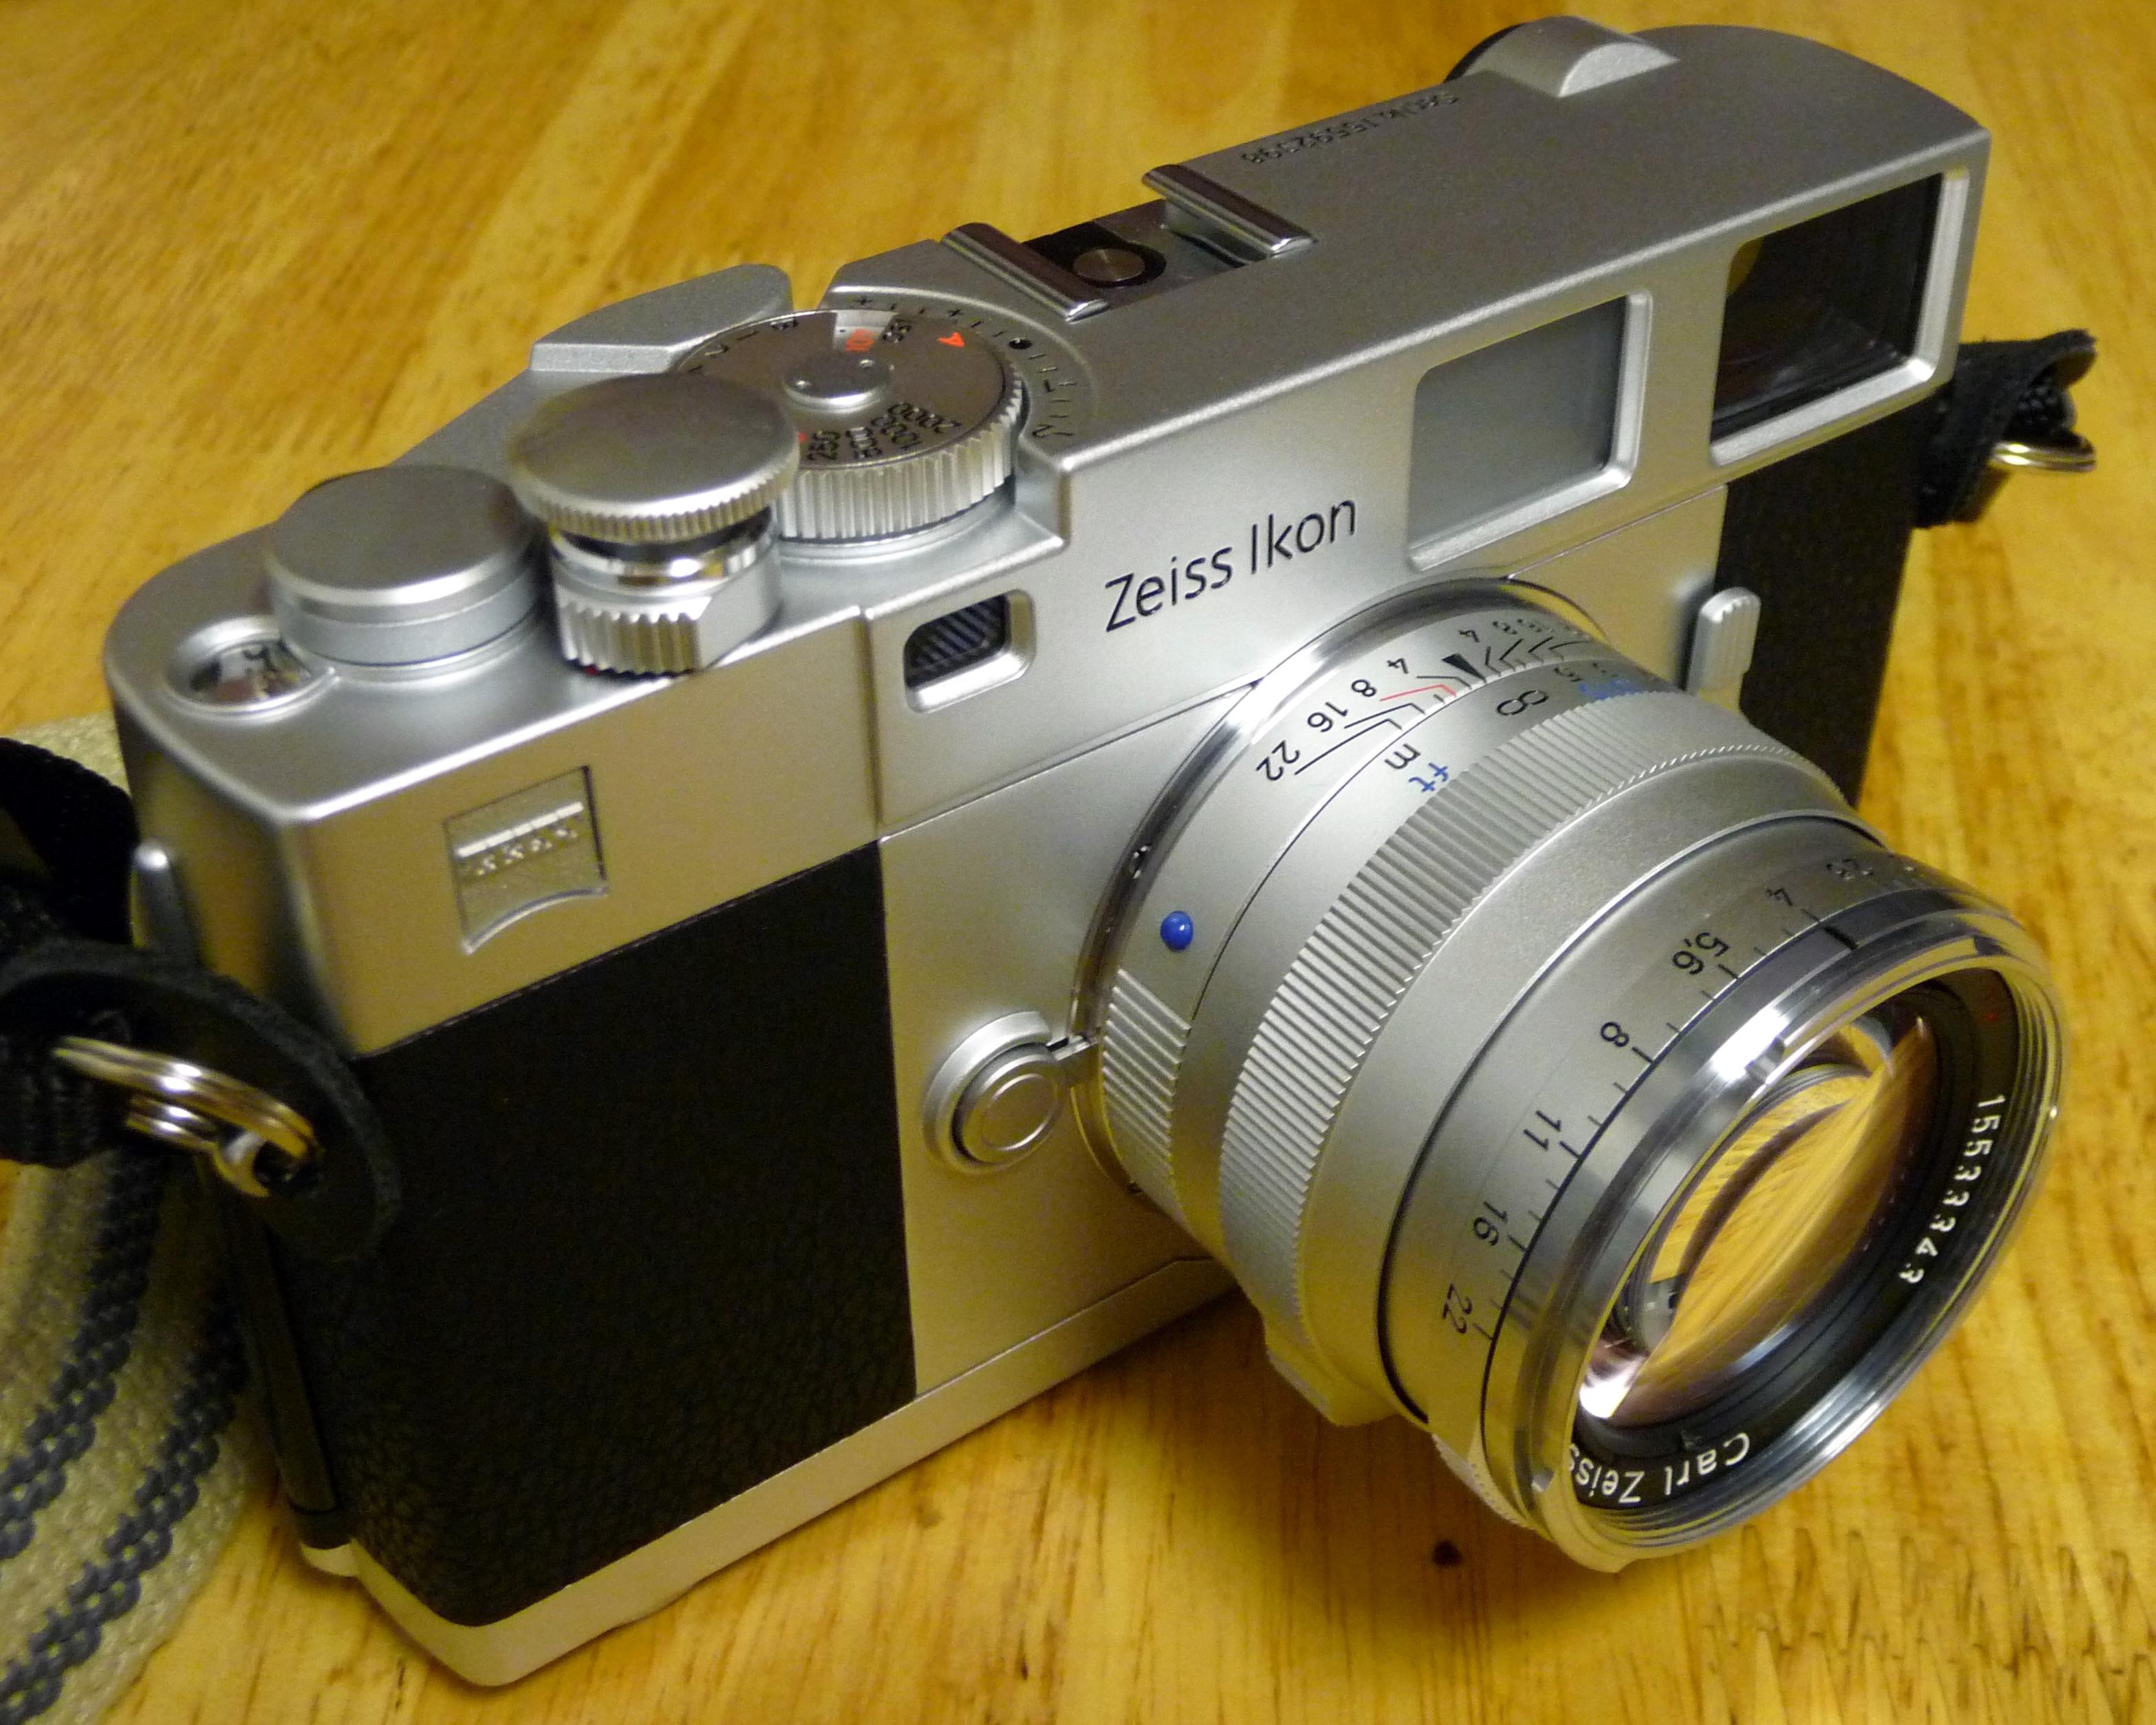 File:Zeiss Ikon ZM 35 mm rangefinder camera with Planar T* 50mm F2